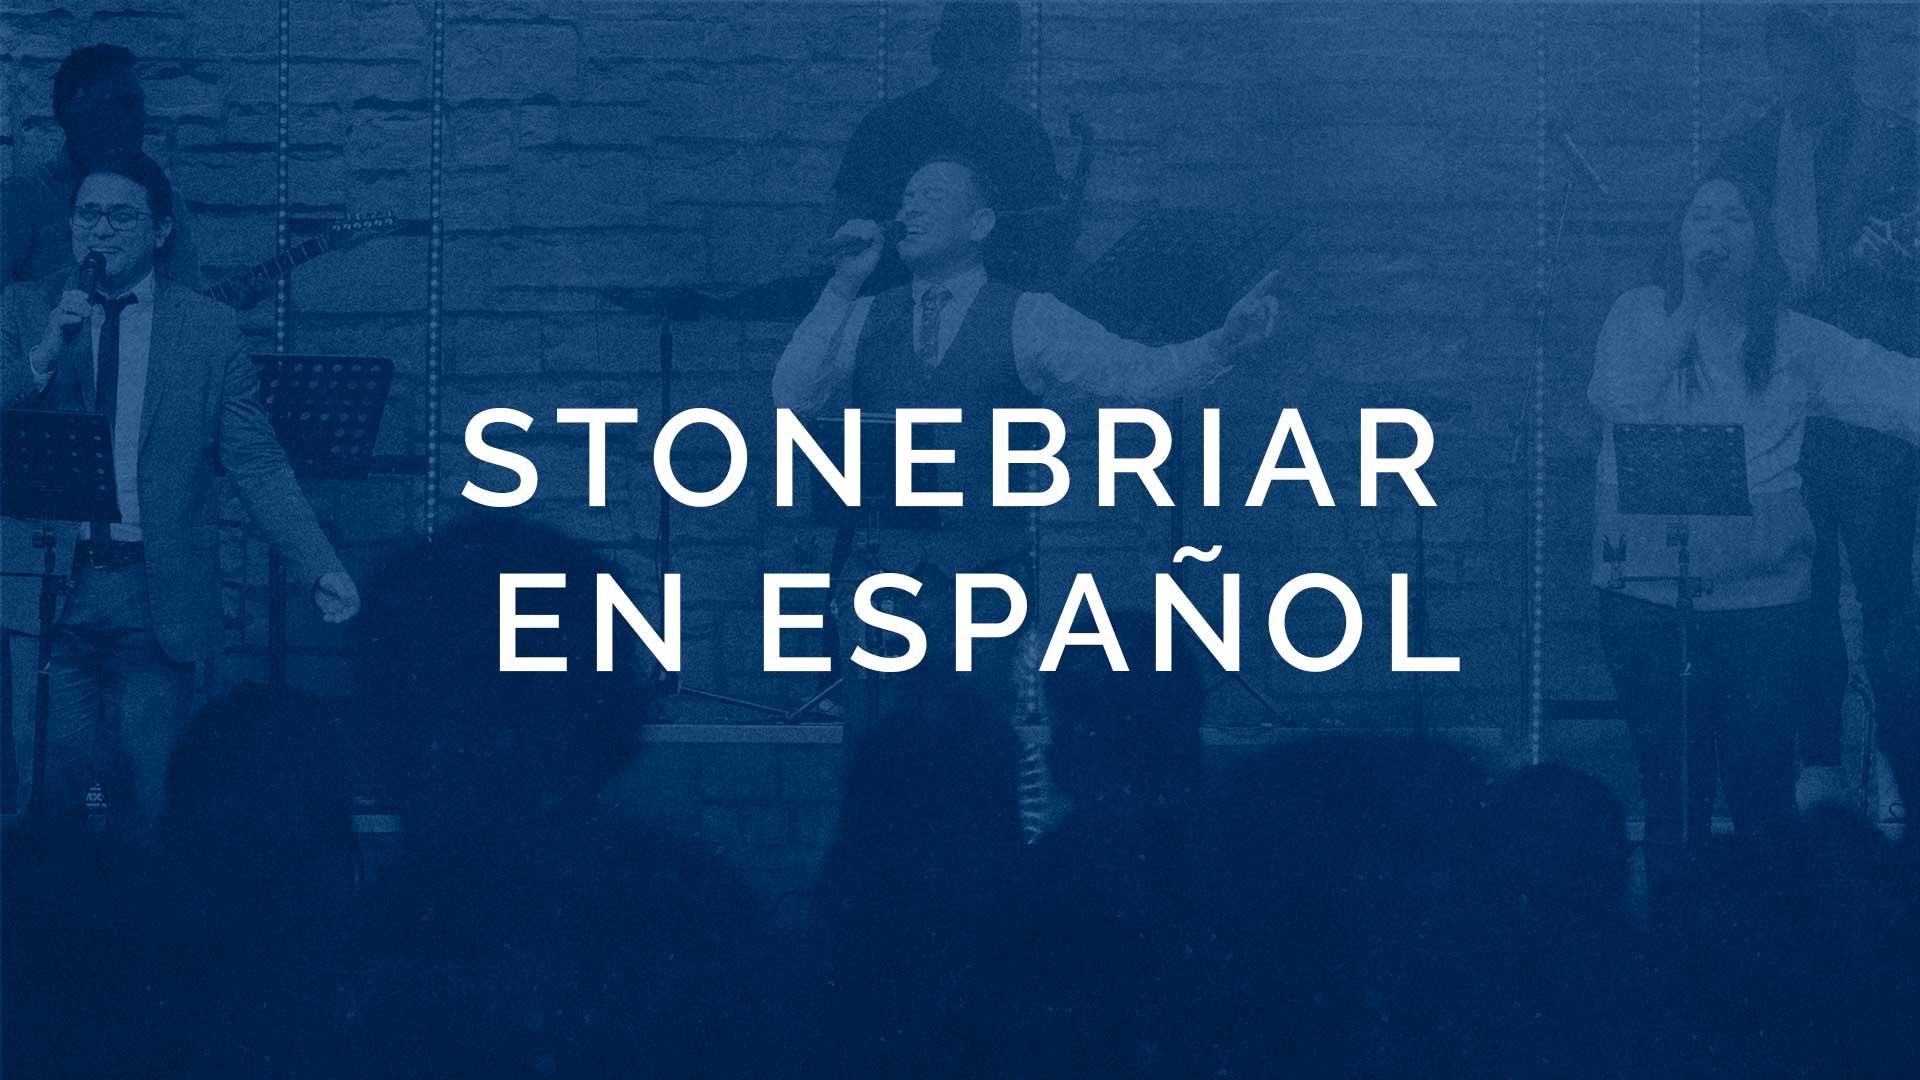 Stonebriar en Español